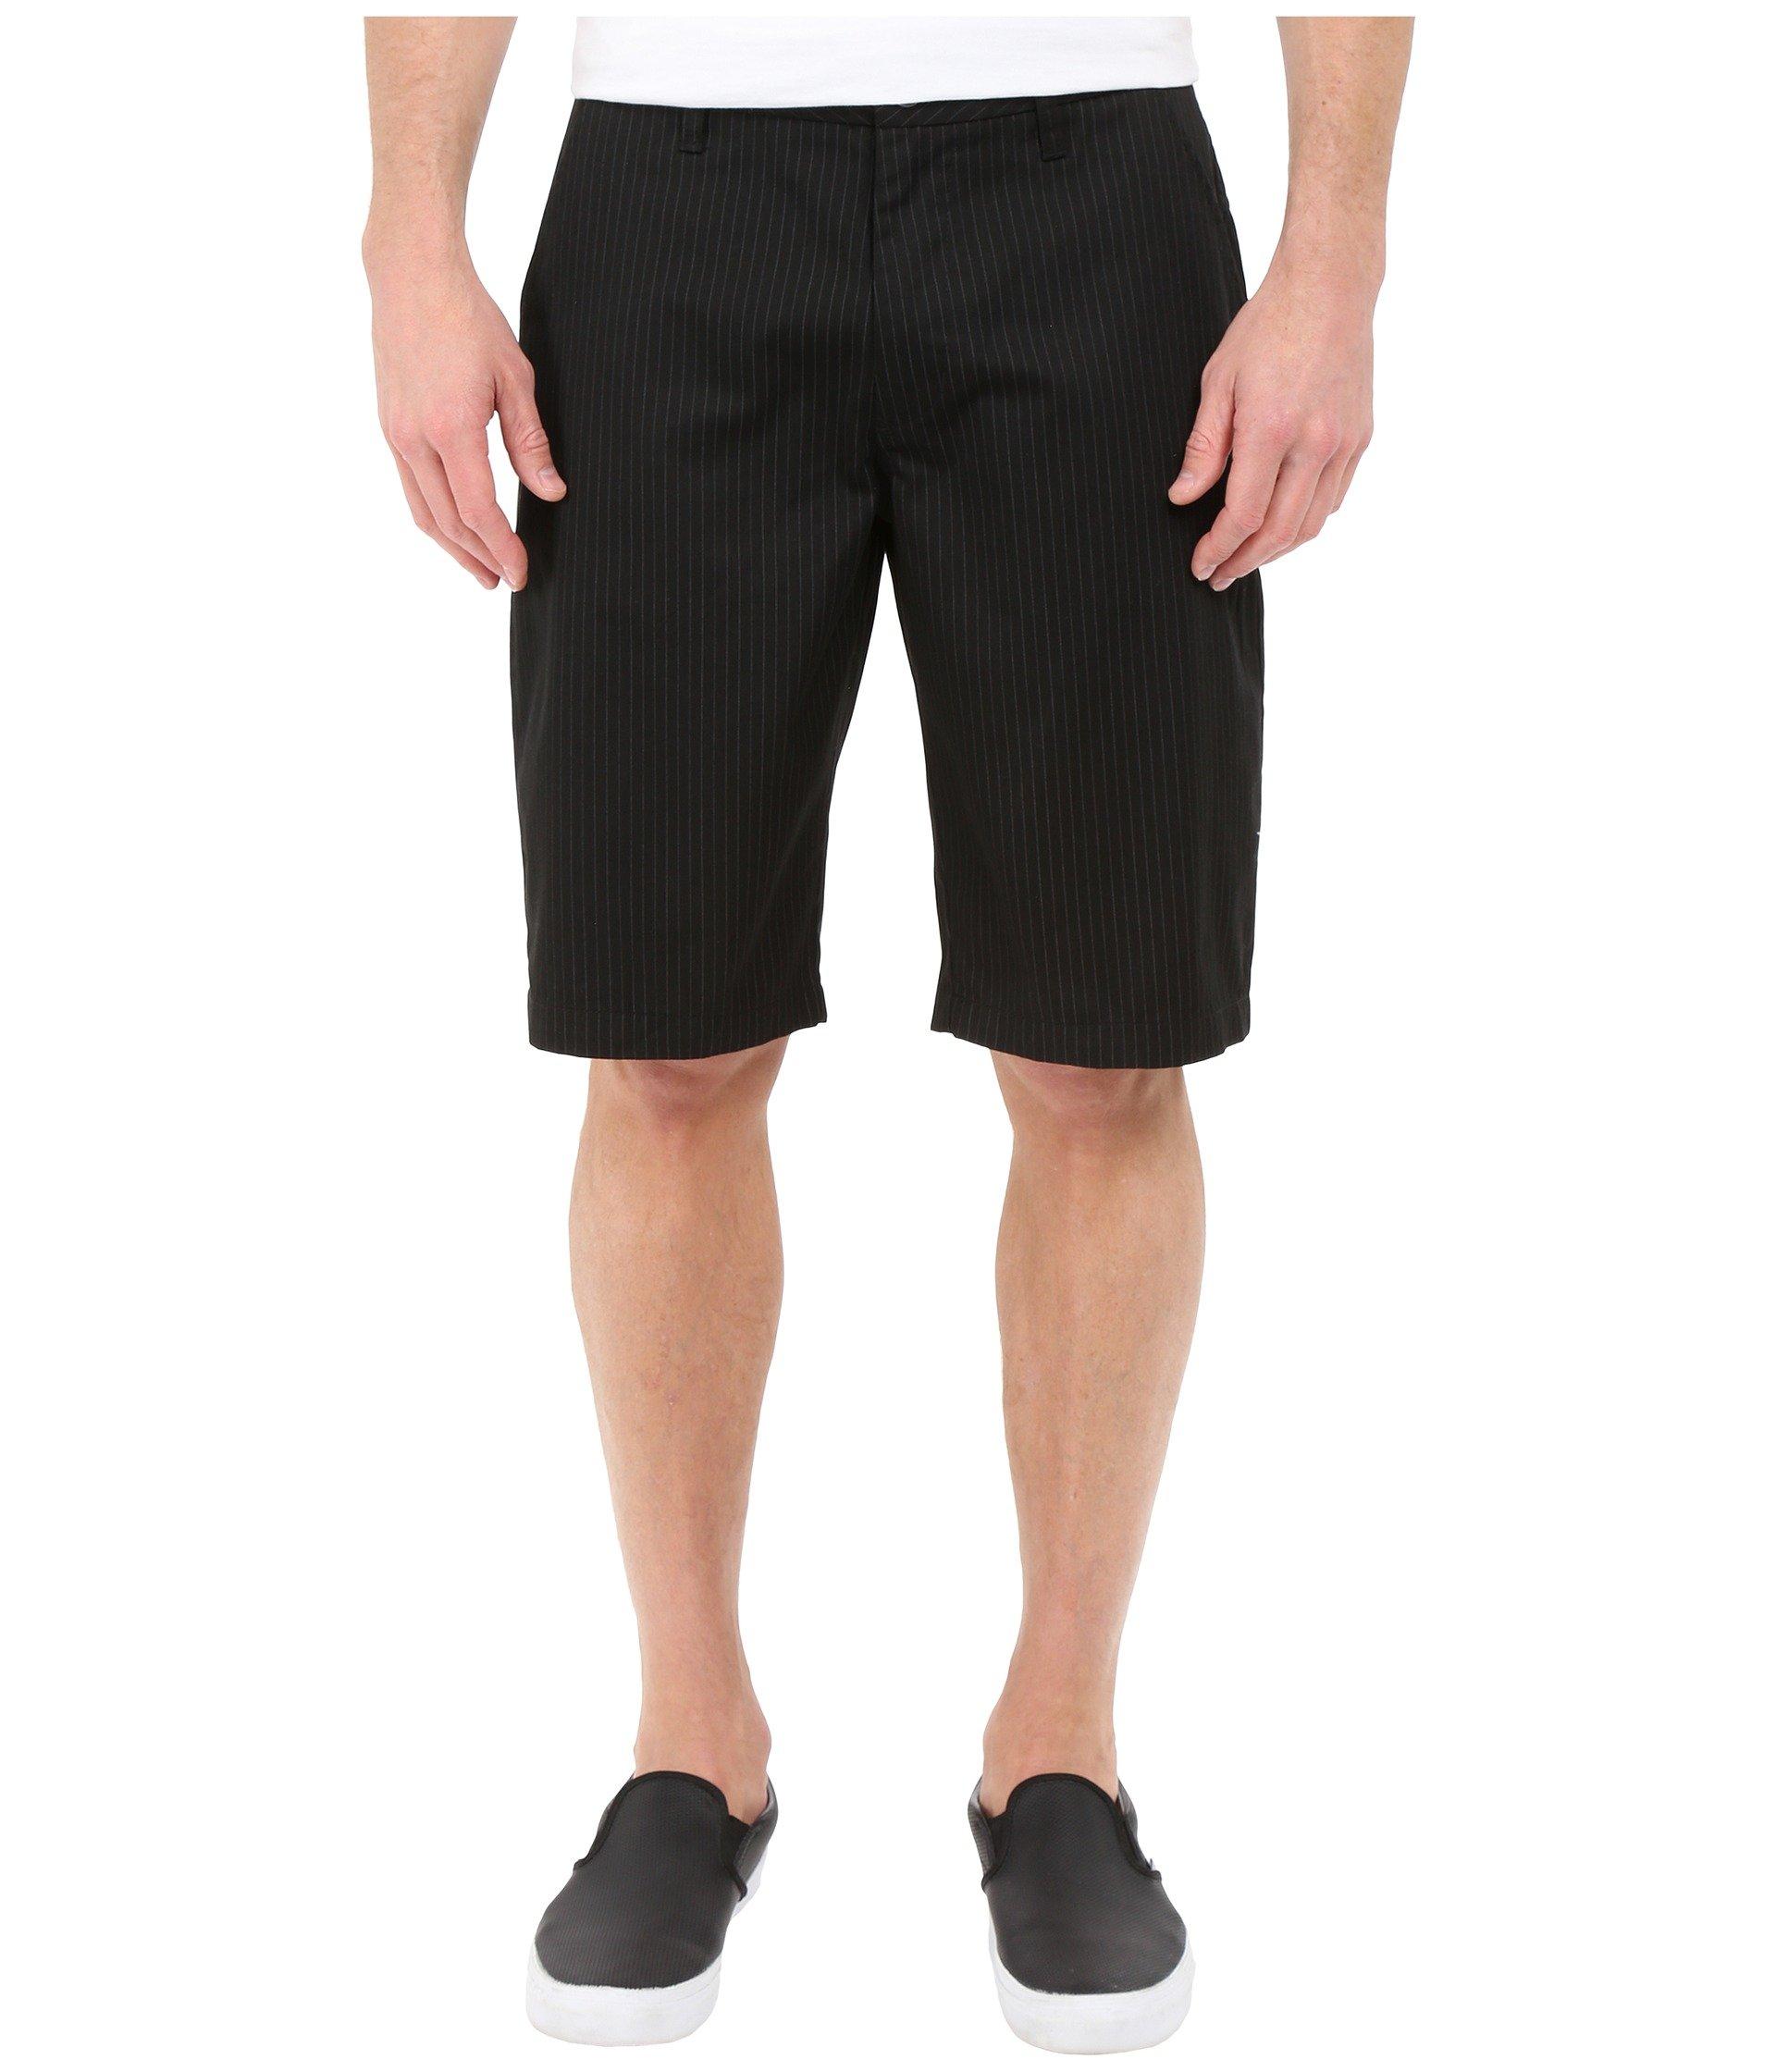 Pantaloneta para Hombre Fox Essex Pinstripe Shorts  + Fox en VeoyCompro.net